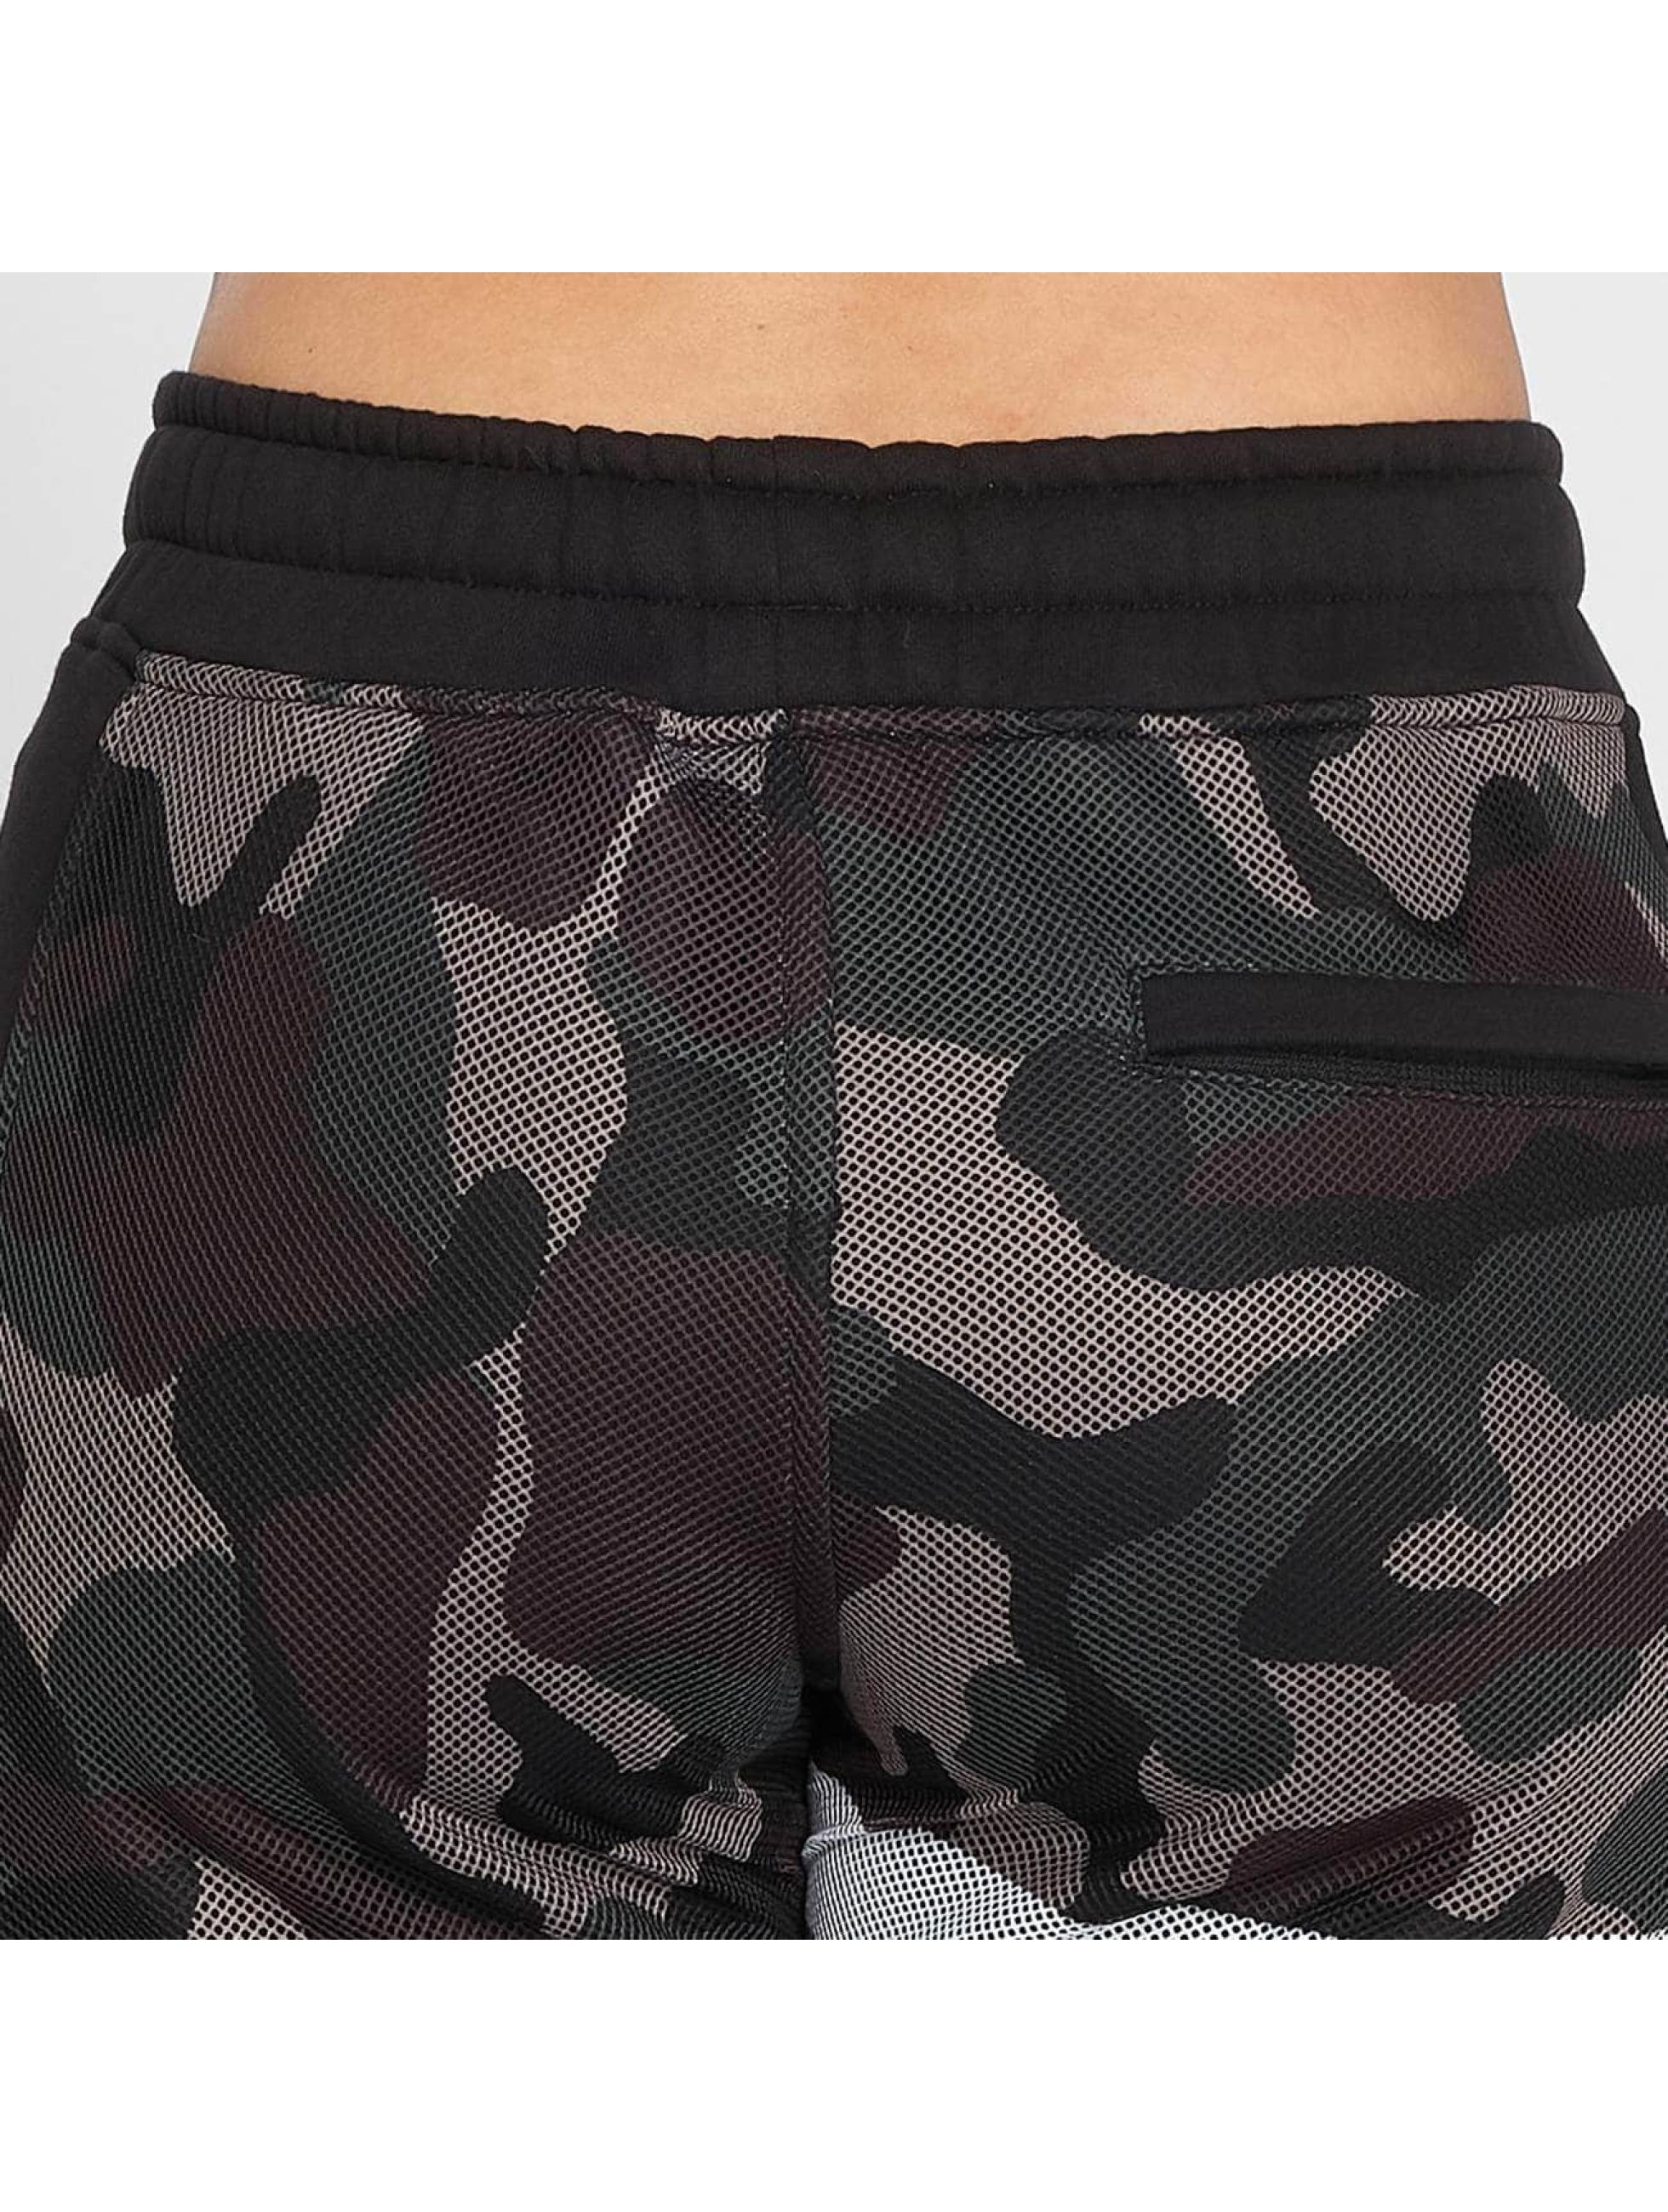 Babystaff Jogginghose Asira camouflage